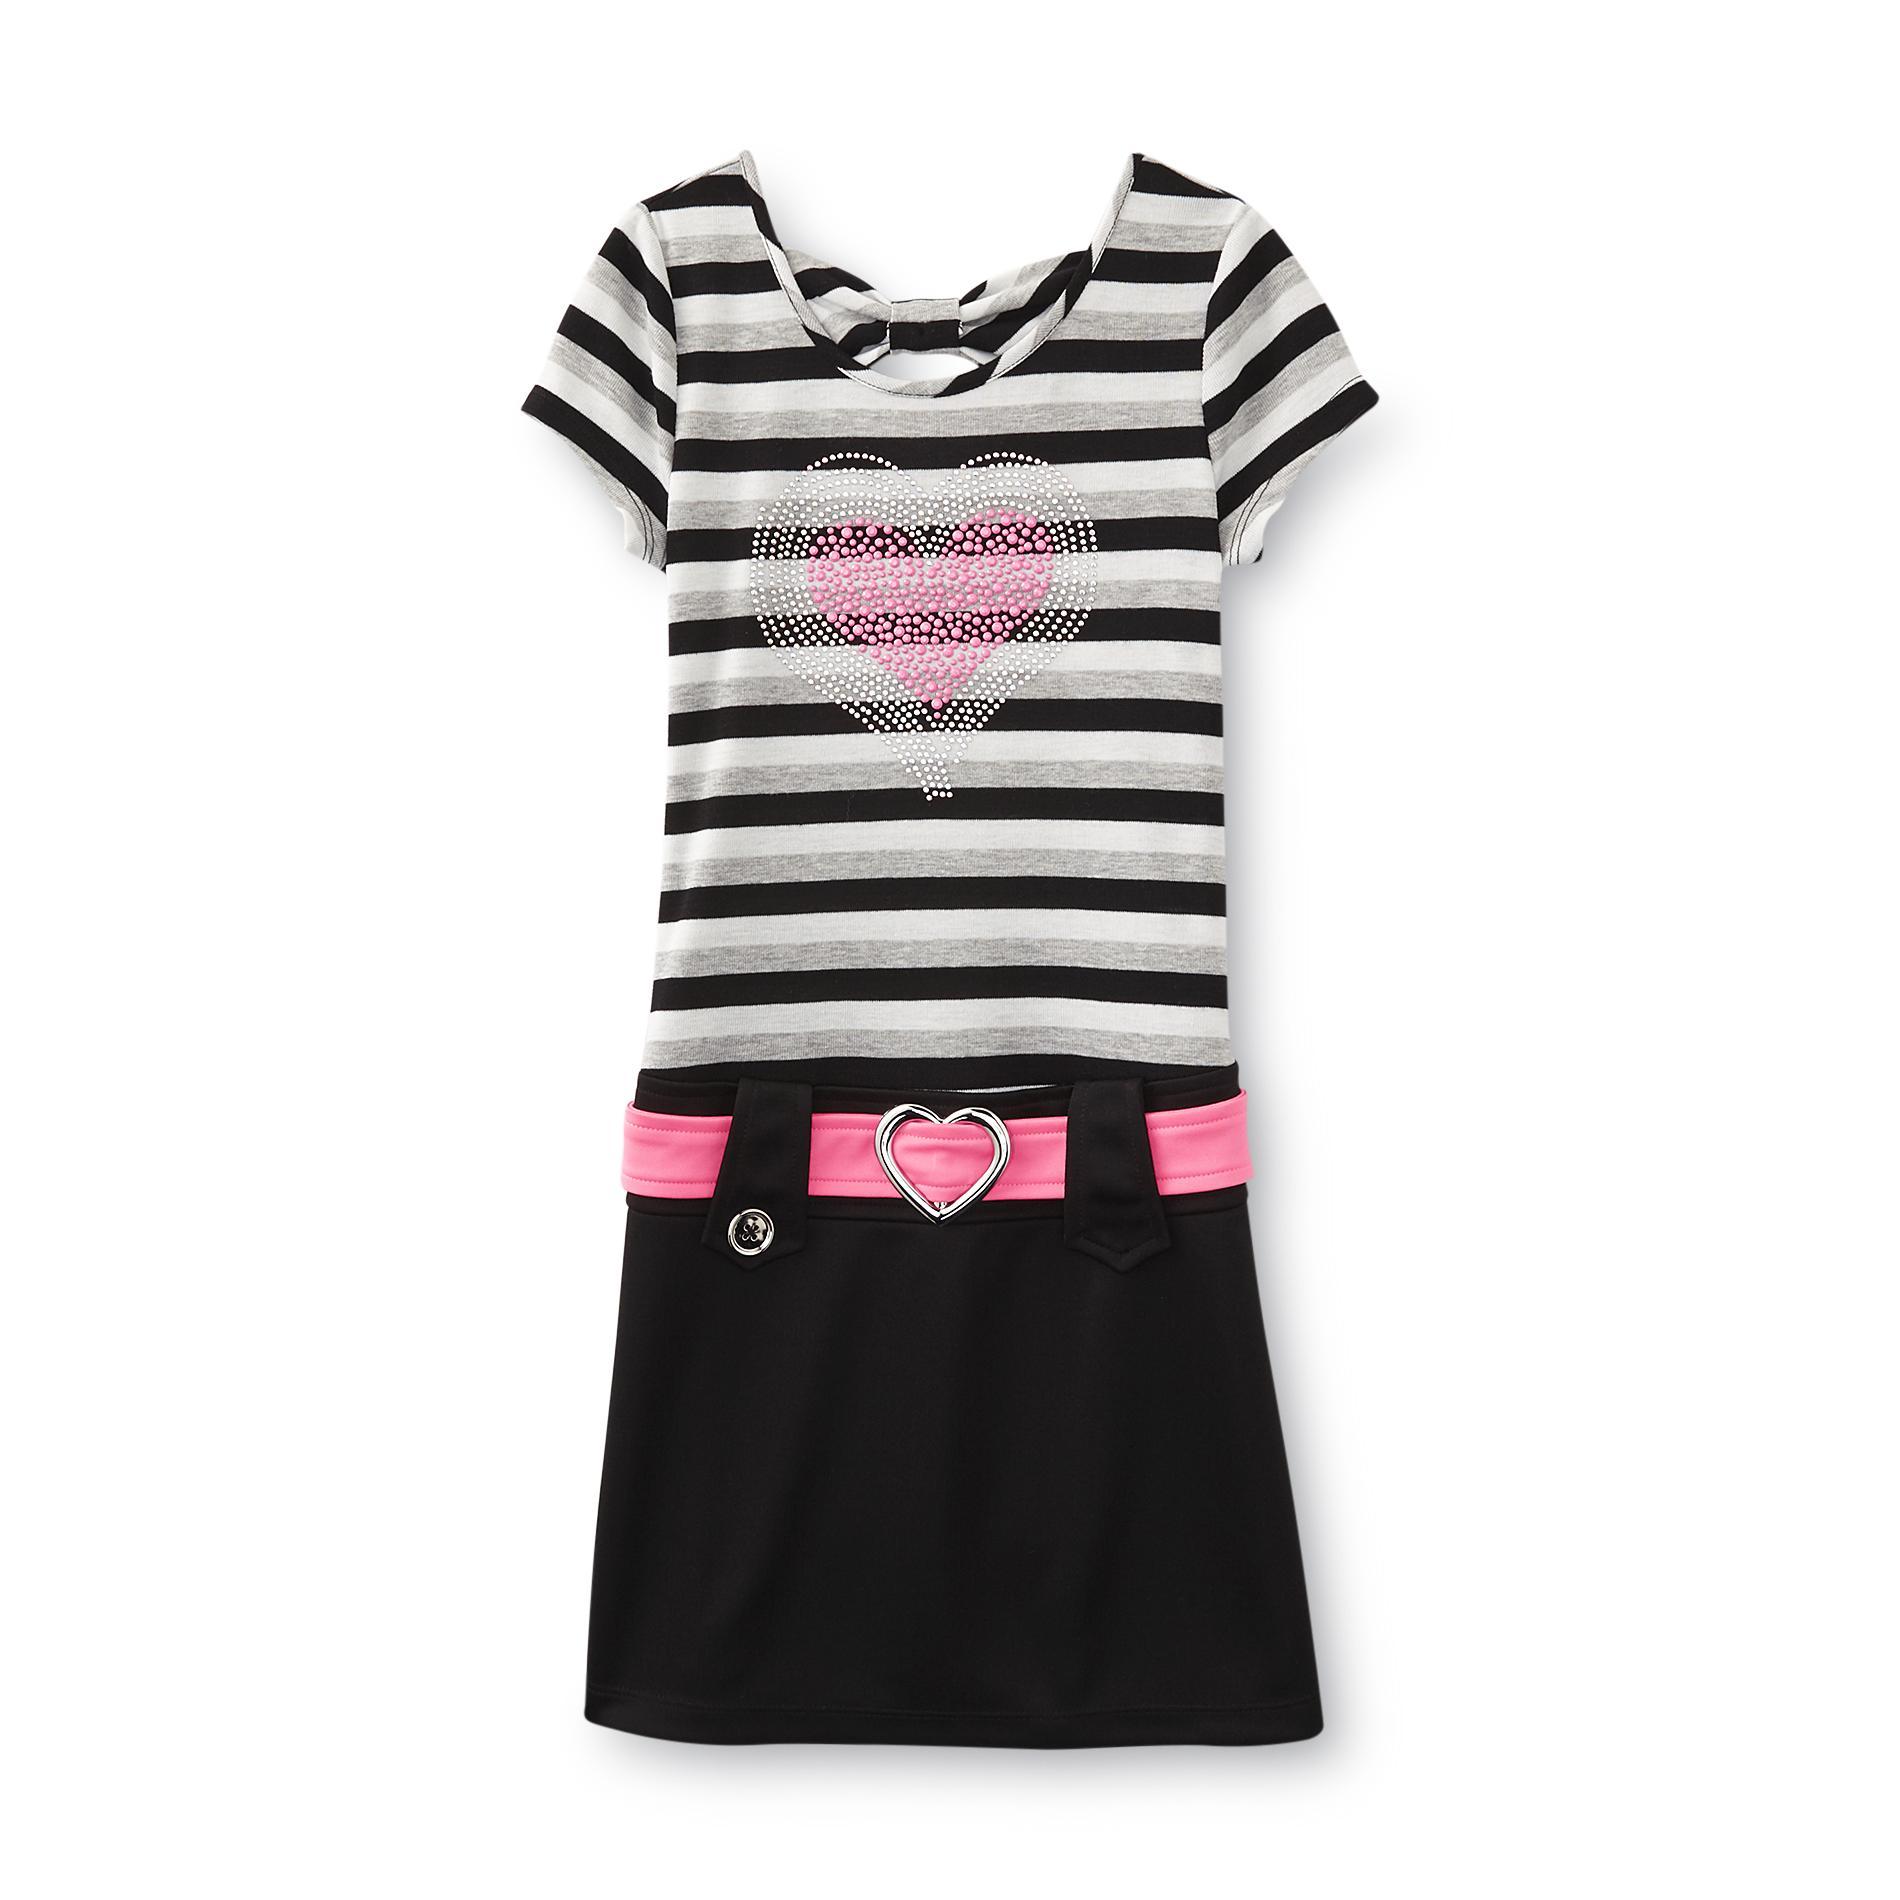 Piper Girl's Marsha Dress - Striped